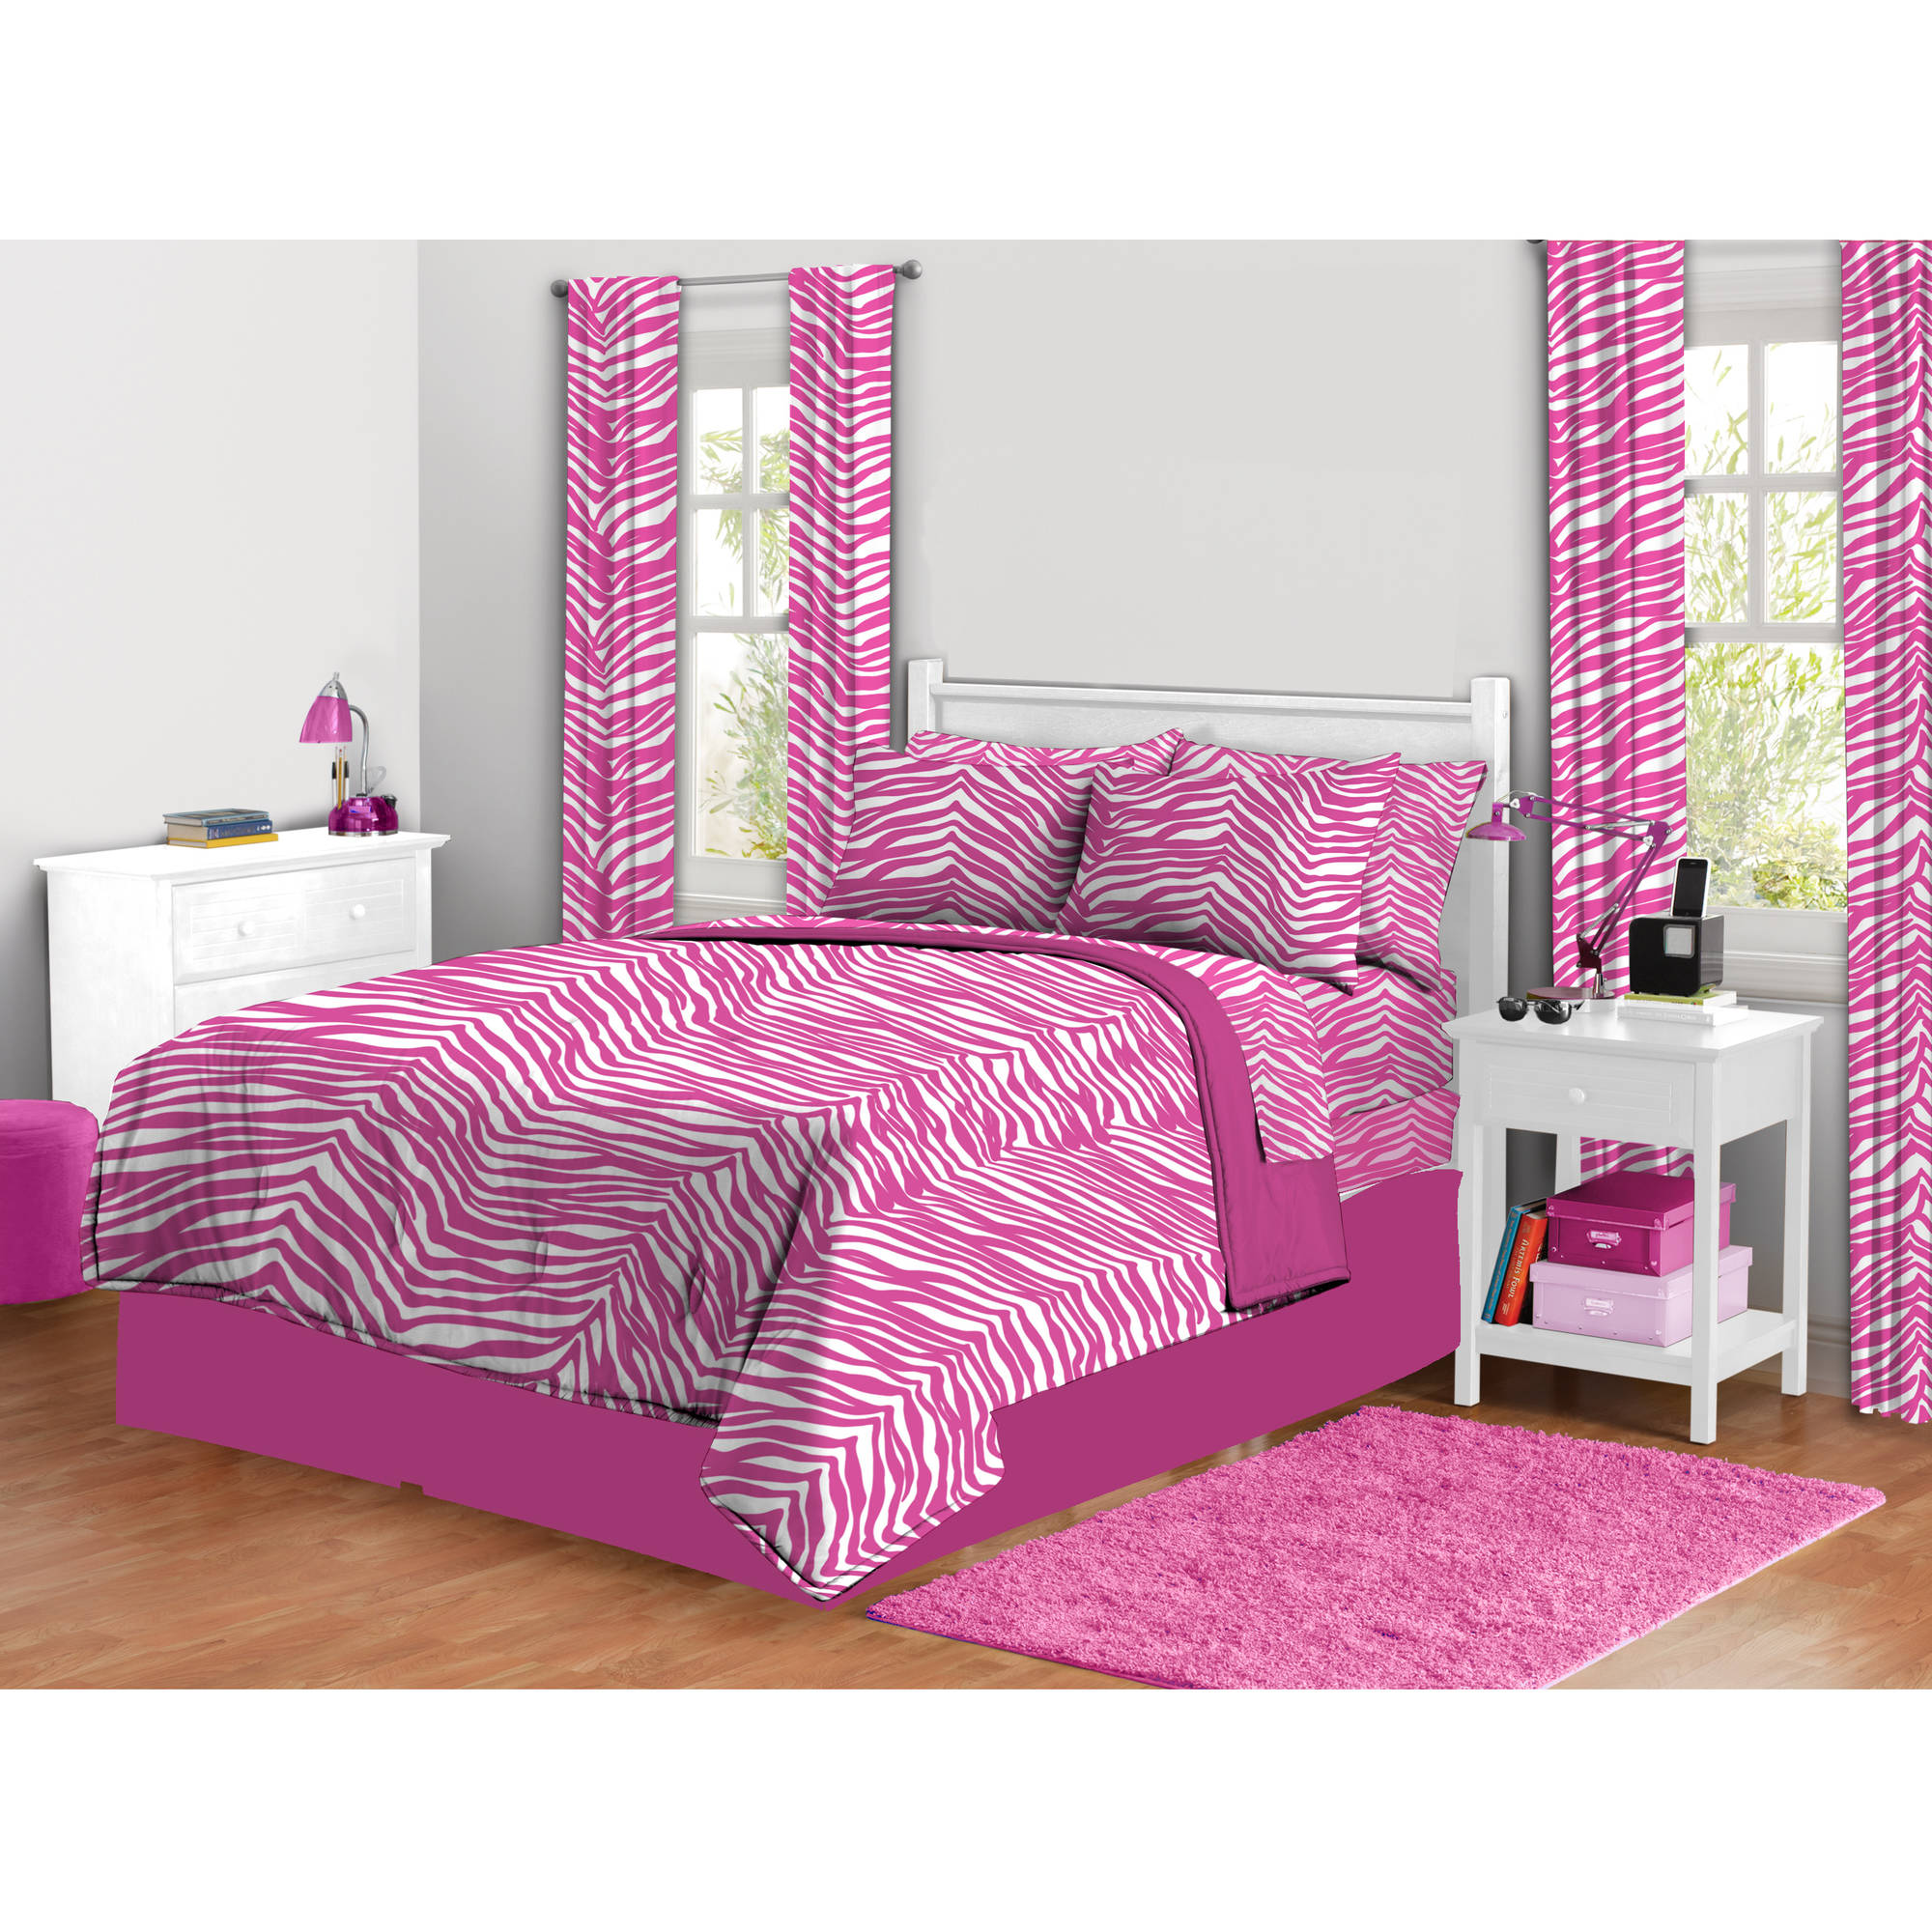 zebra print complete bed in a bag bedding set - walmart